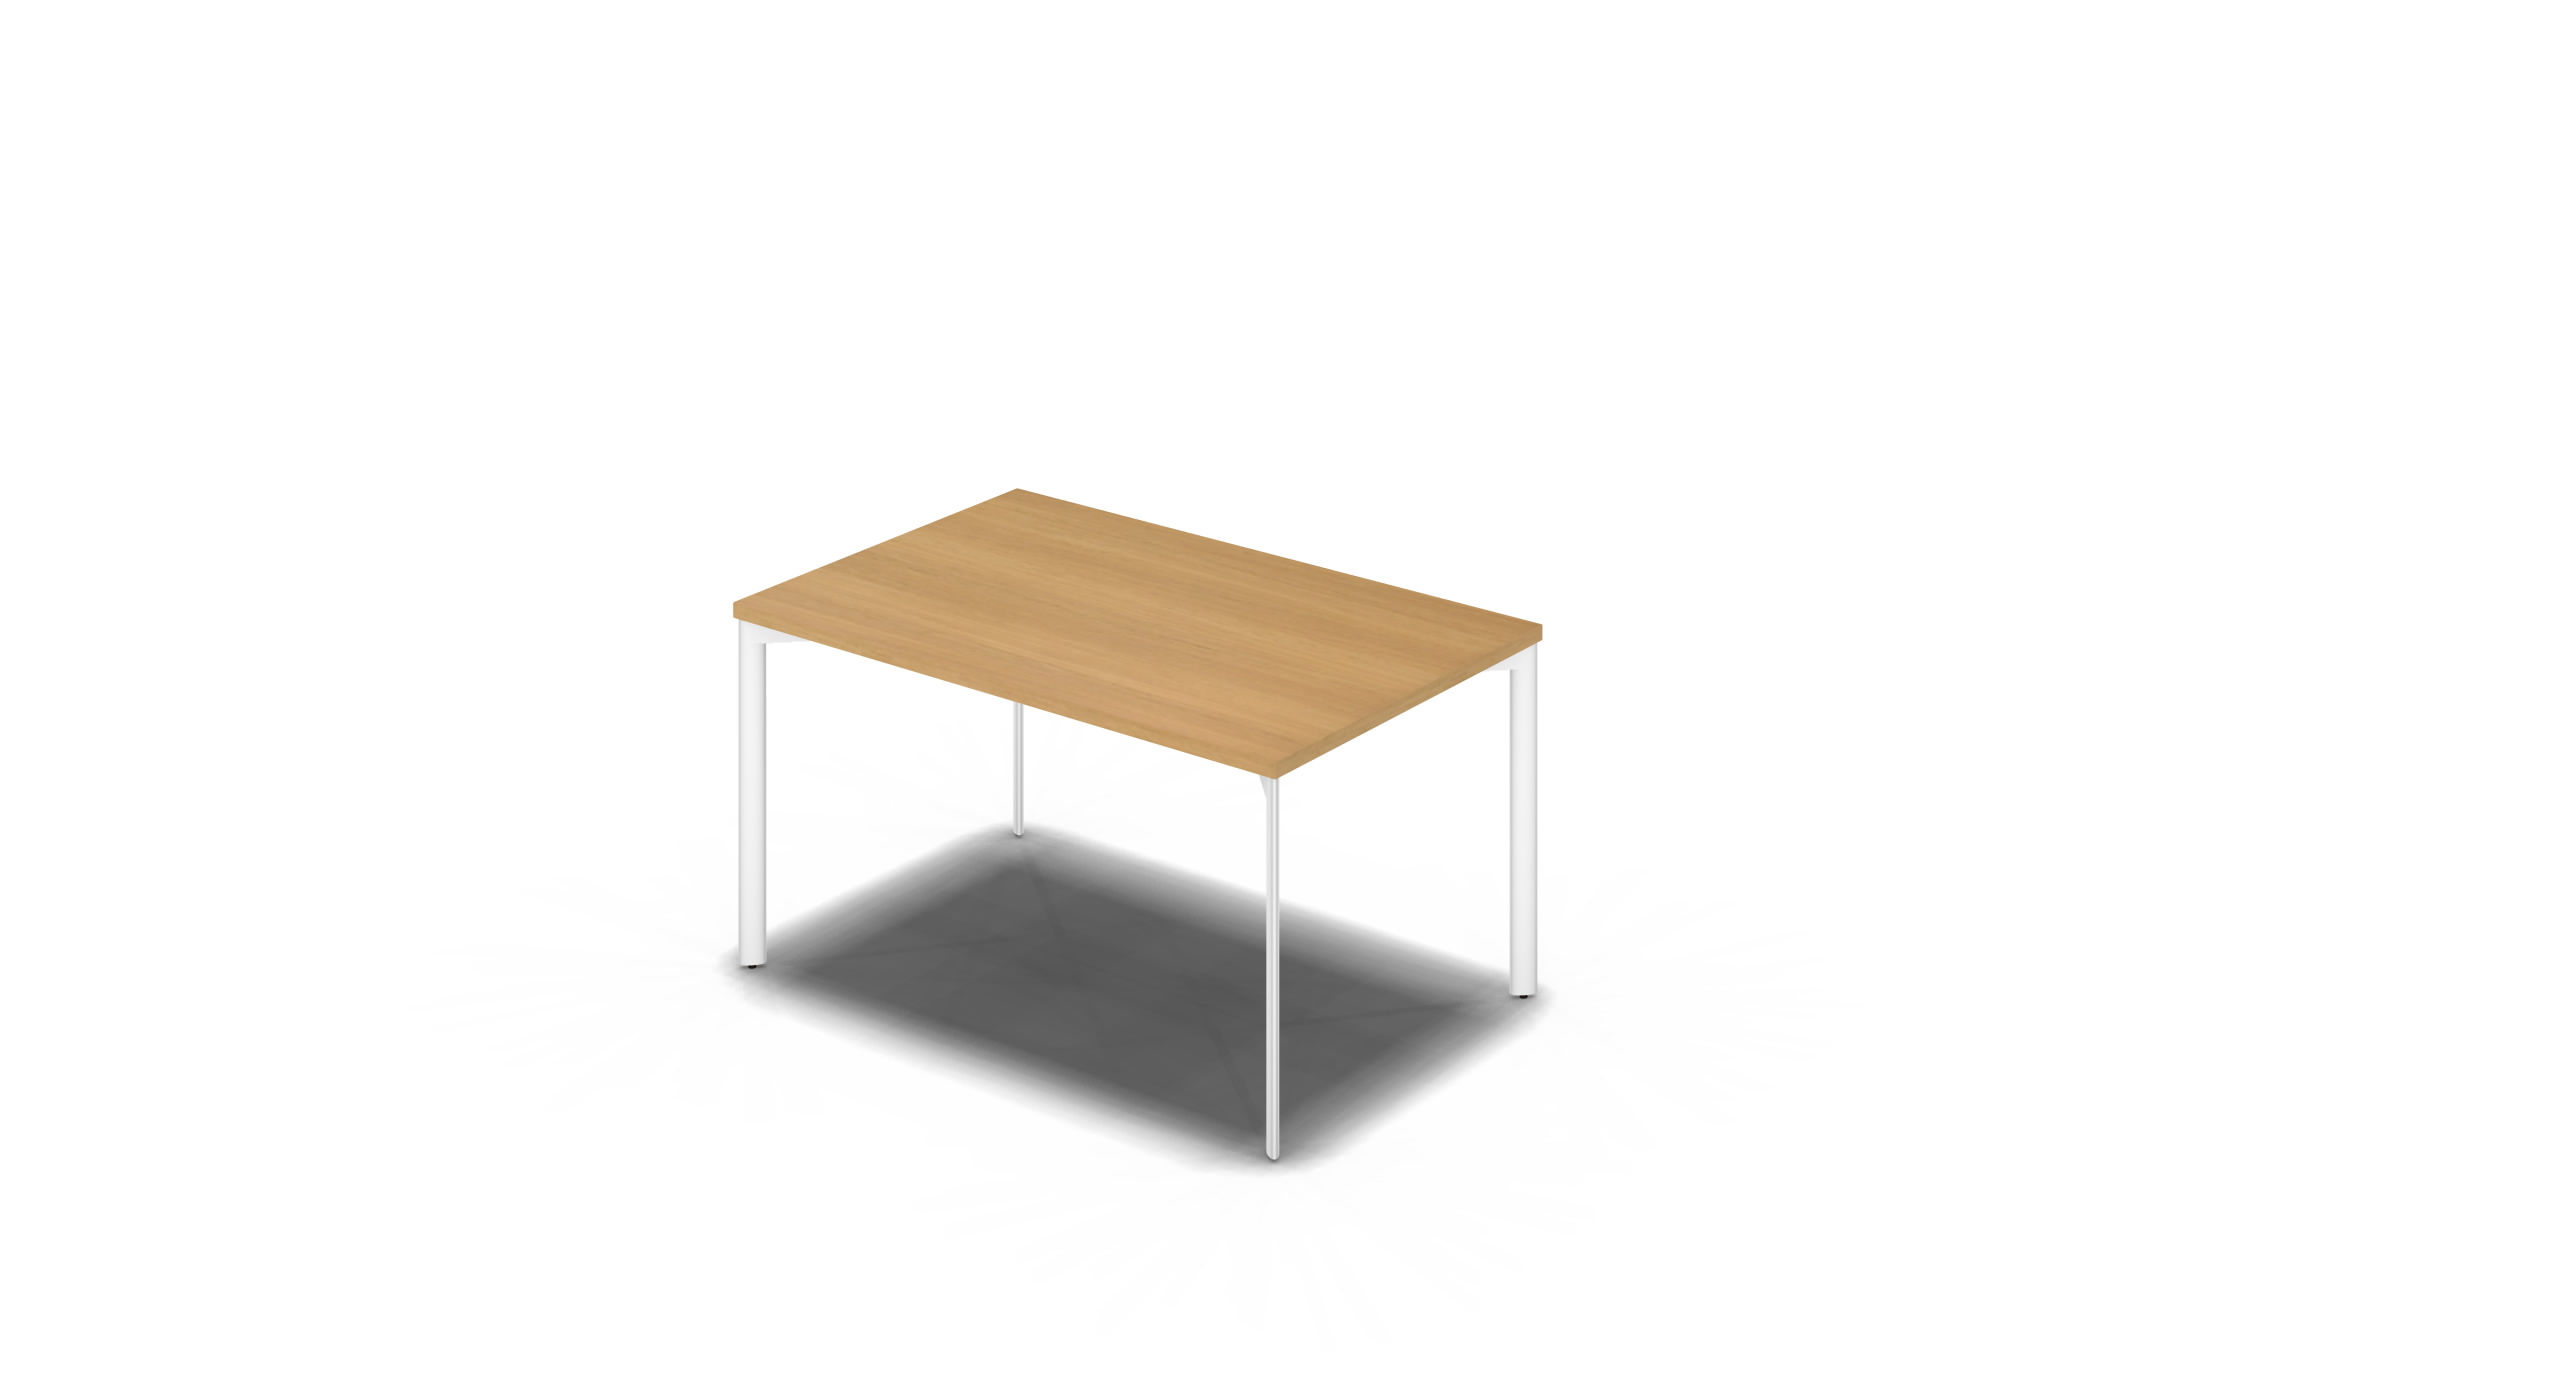 Table_Slim_1200x750_White_Oak_noOption